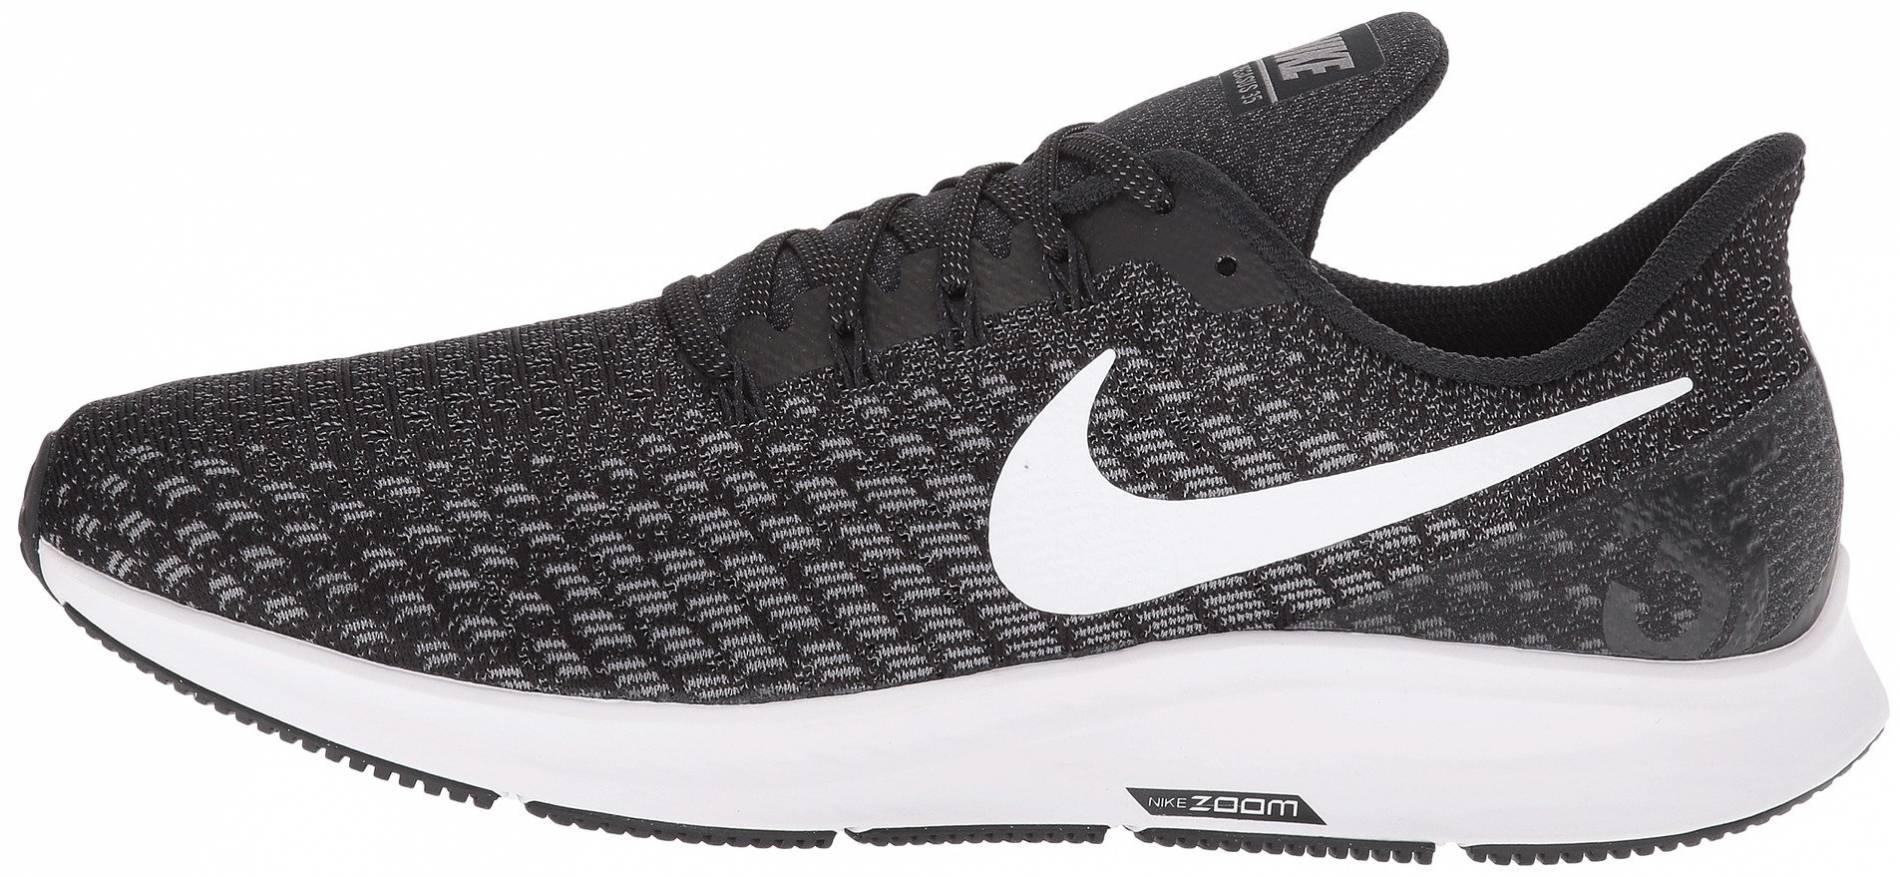 Talentoso sistemático Un pan  Nike Air Zoom Pegasus 35 - Deals ($85), Facts, Reviews (2021) | RunRepeat